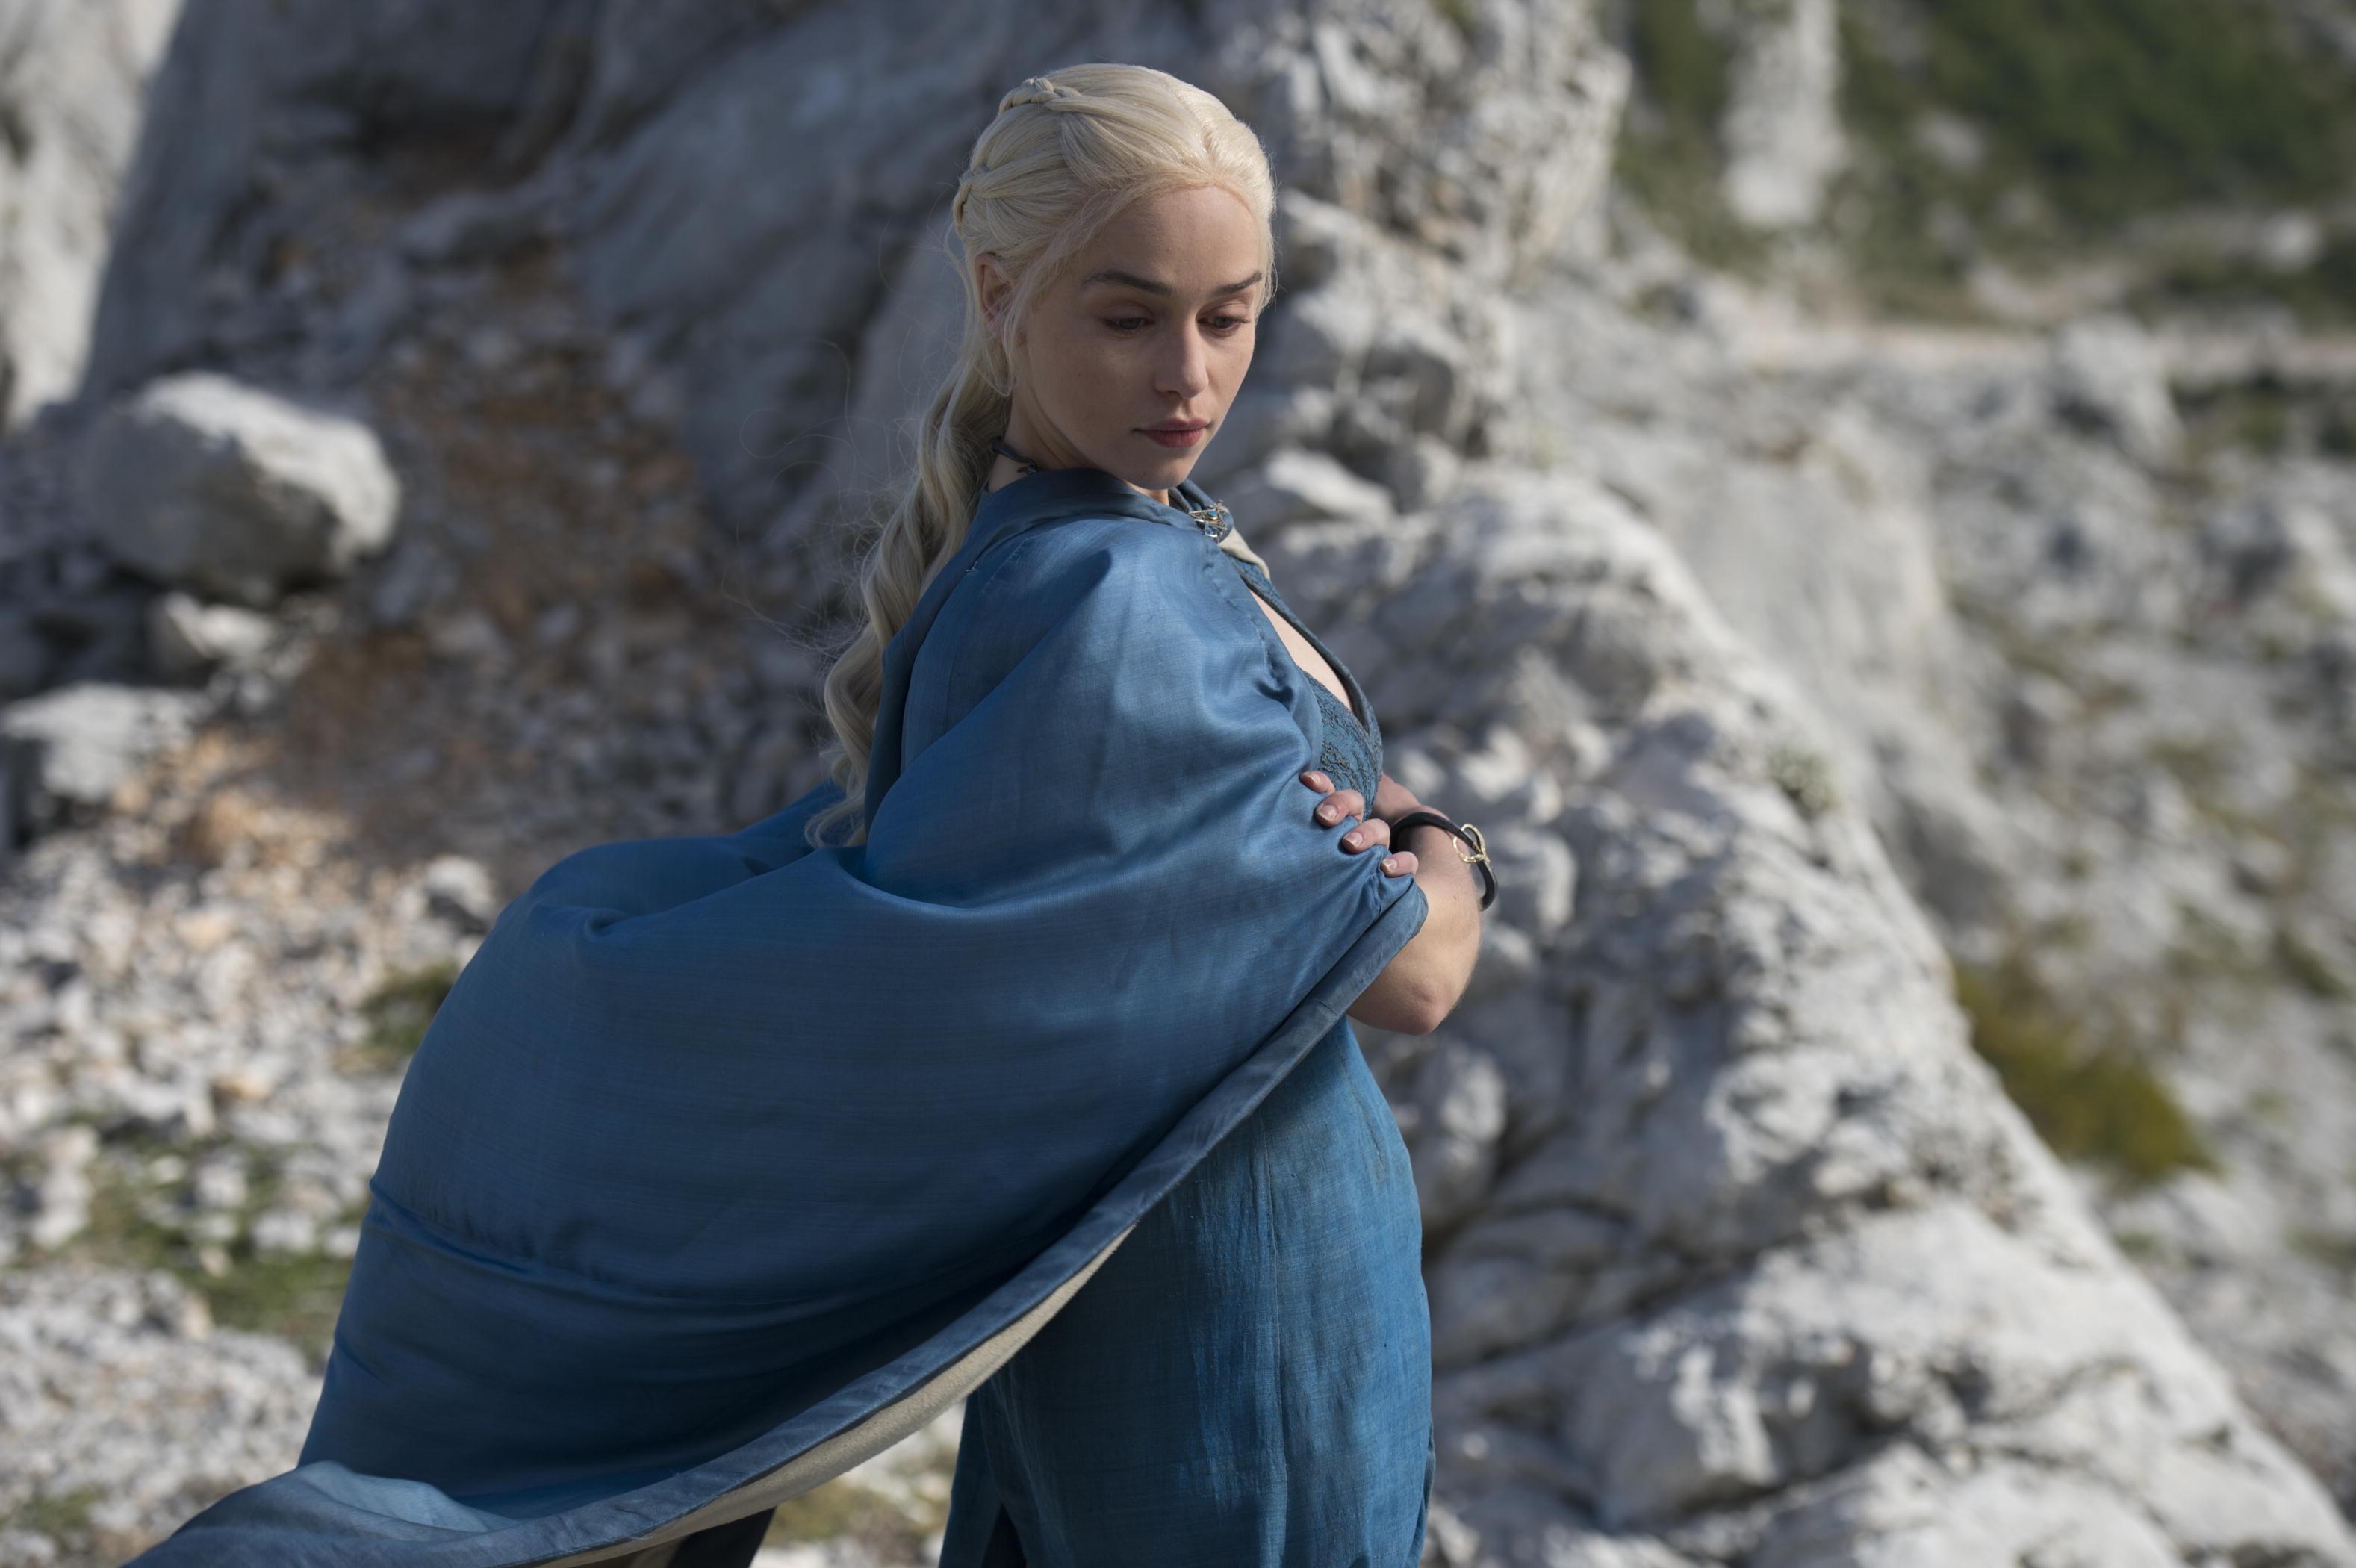 Game-of-Thrones-Season-4-Emilia-Clarke-Daenerys-Targaryen